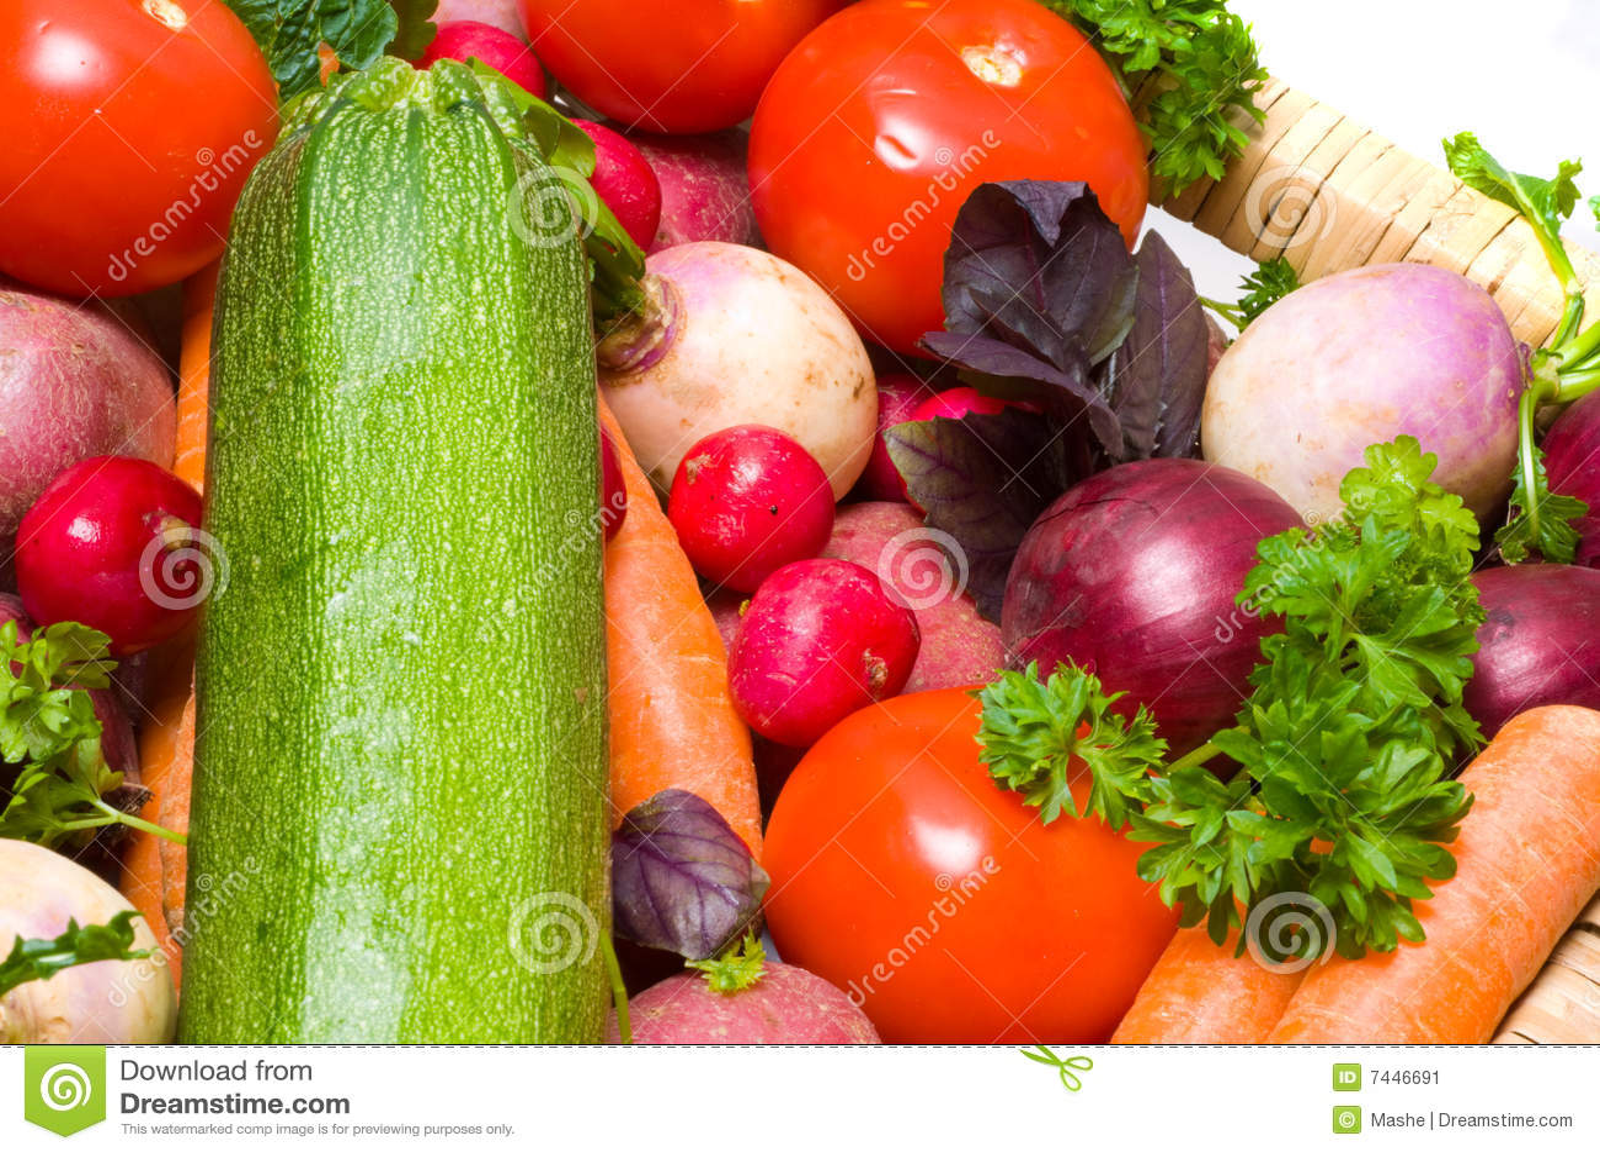 Beautiful vegetables yield stock image image 7446691 for Beautiful vegetables